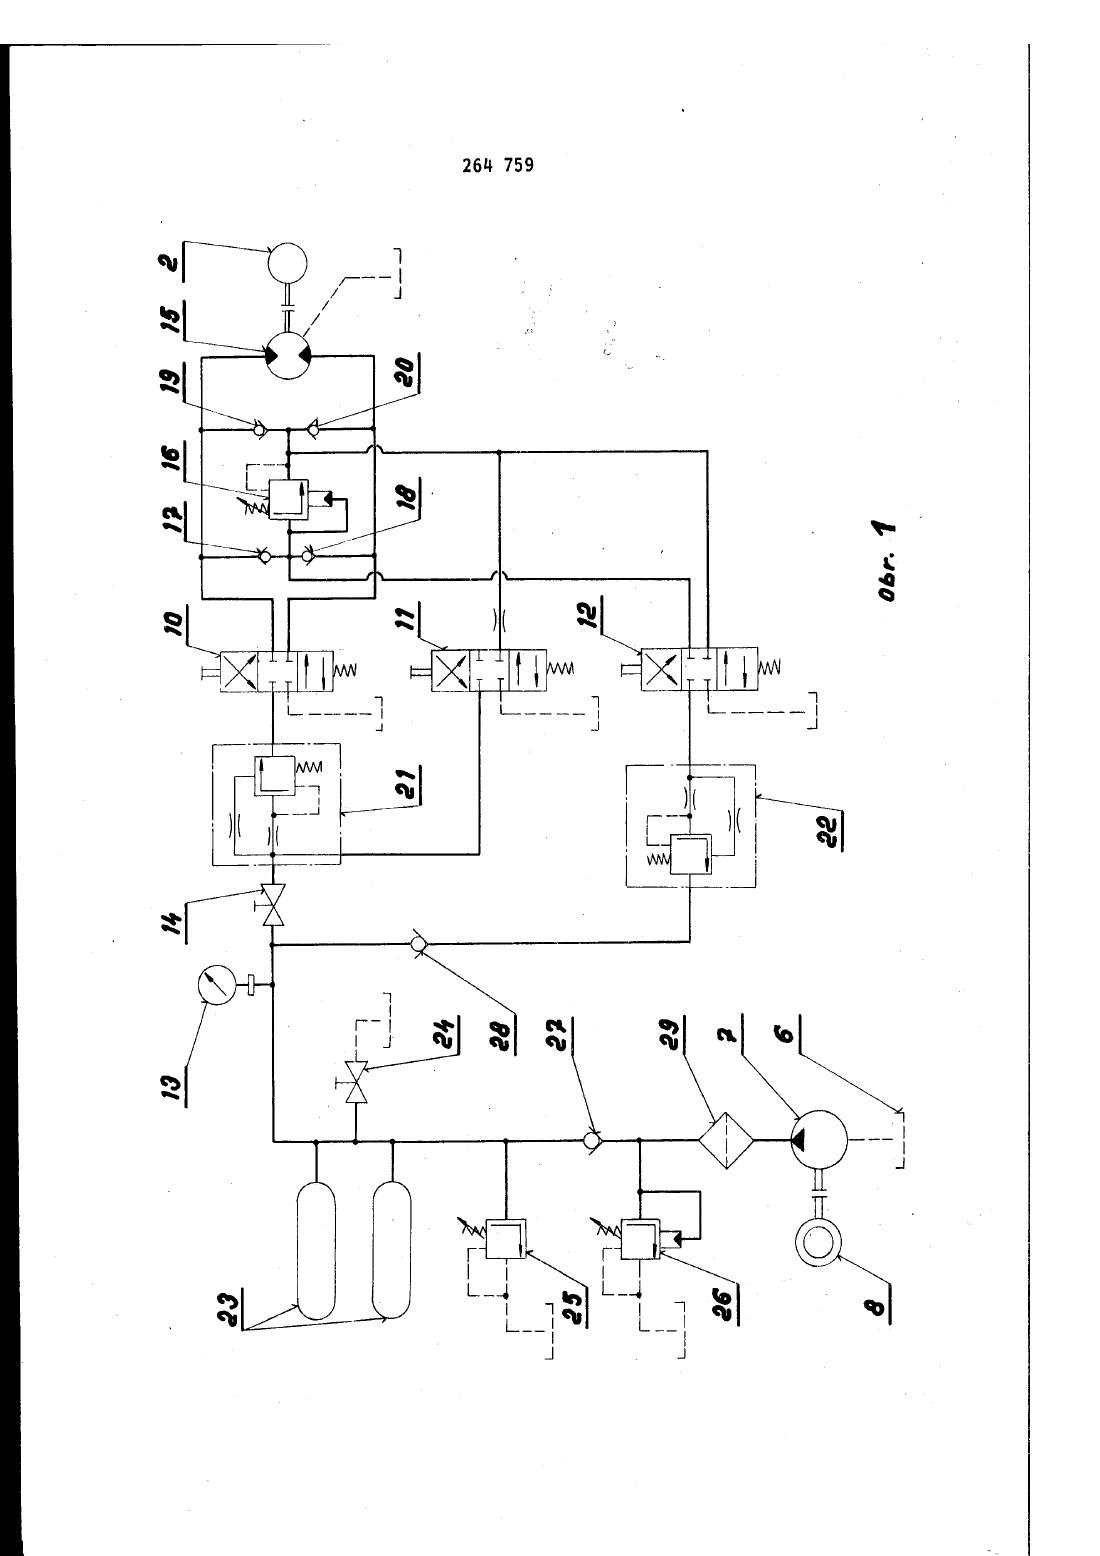 Zapojeni Hydroakumulatoroveho Pohonu Voziku Pro Dopravu Rubaniny A